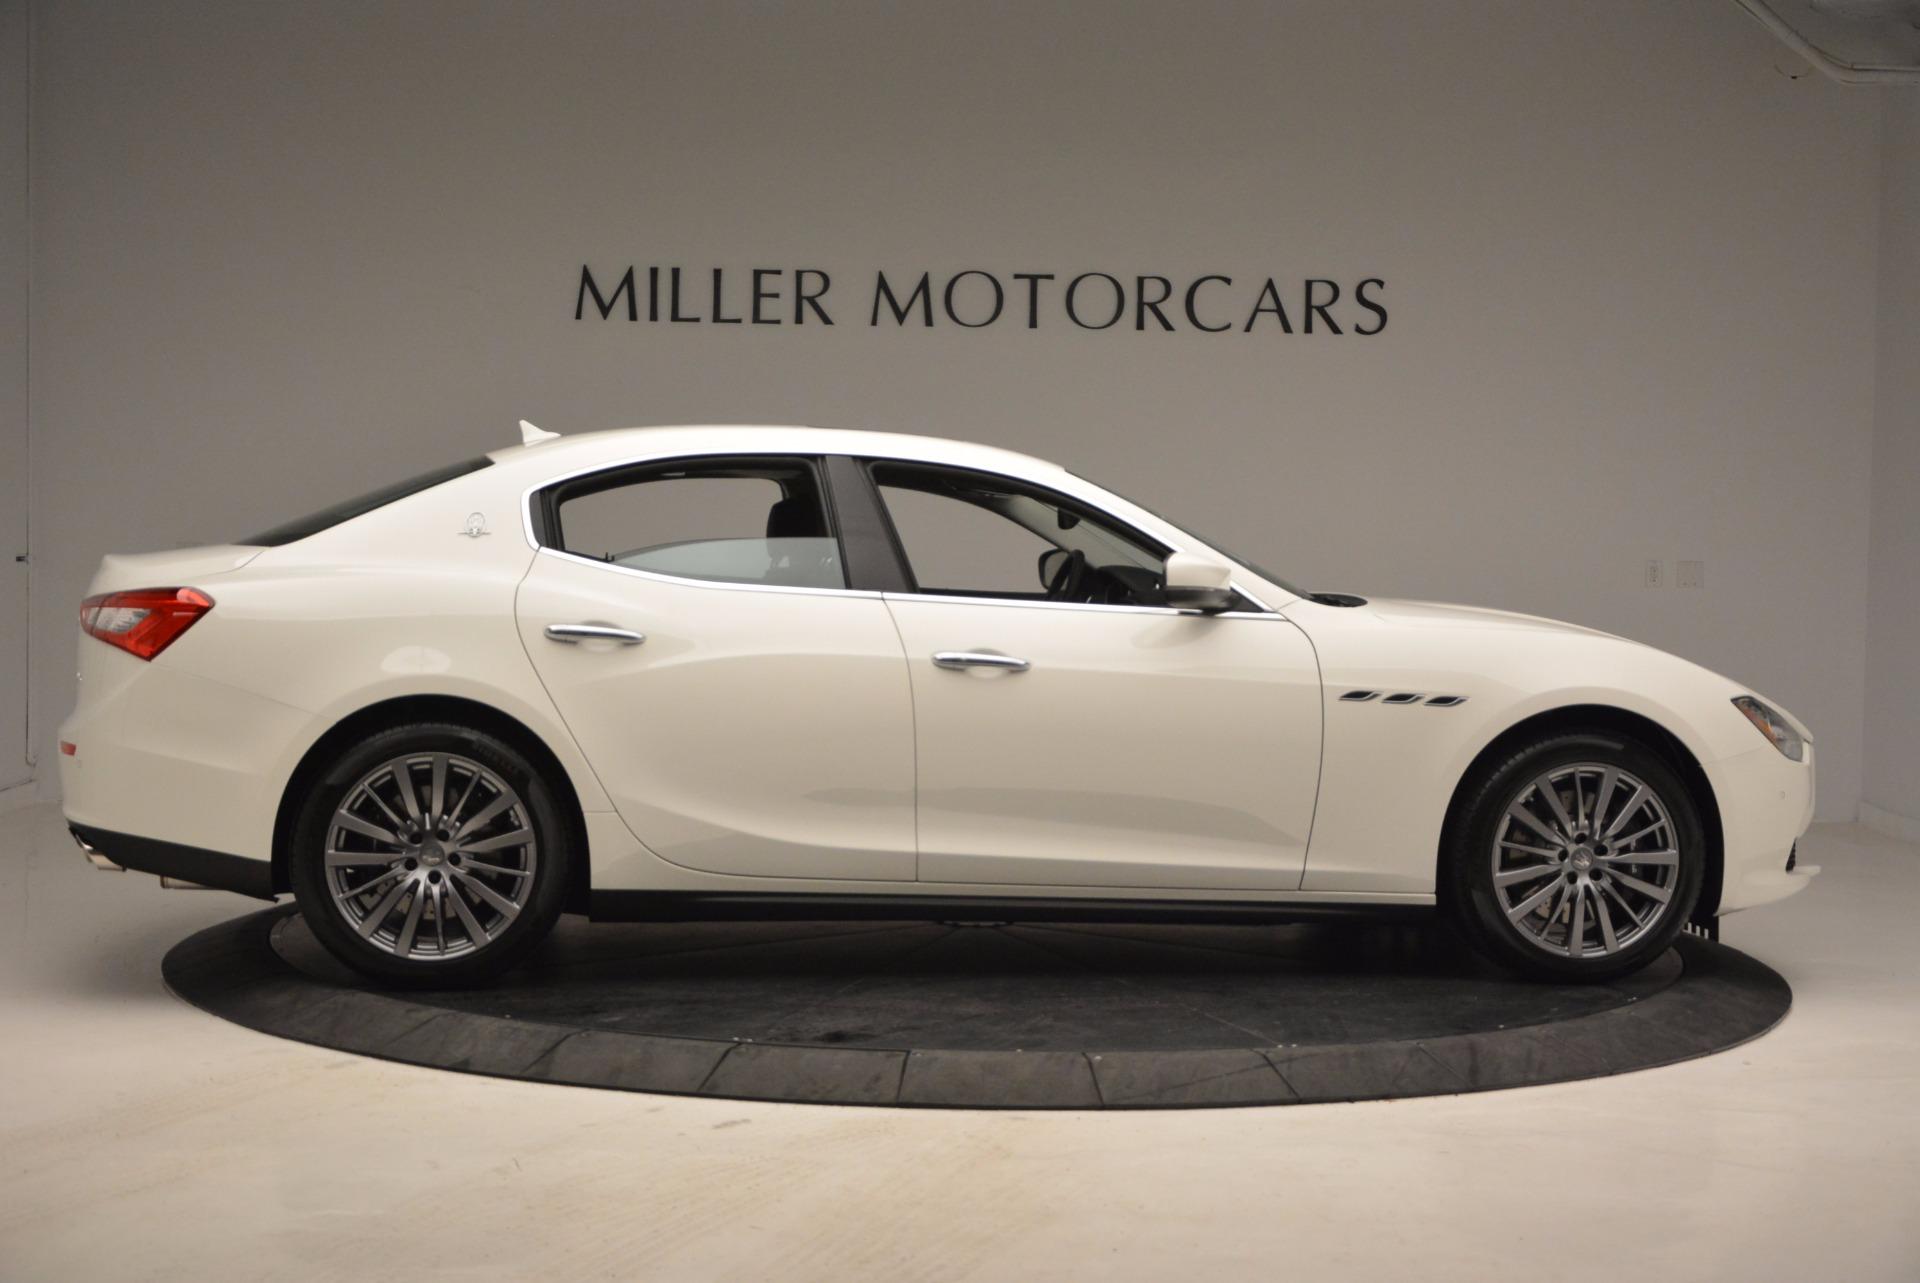 New 2017 Maserati Ghibli S Q4 EX-Loaner For Sale In Westport, CT 1031_p9